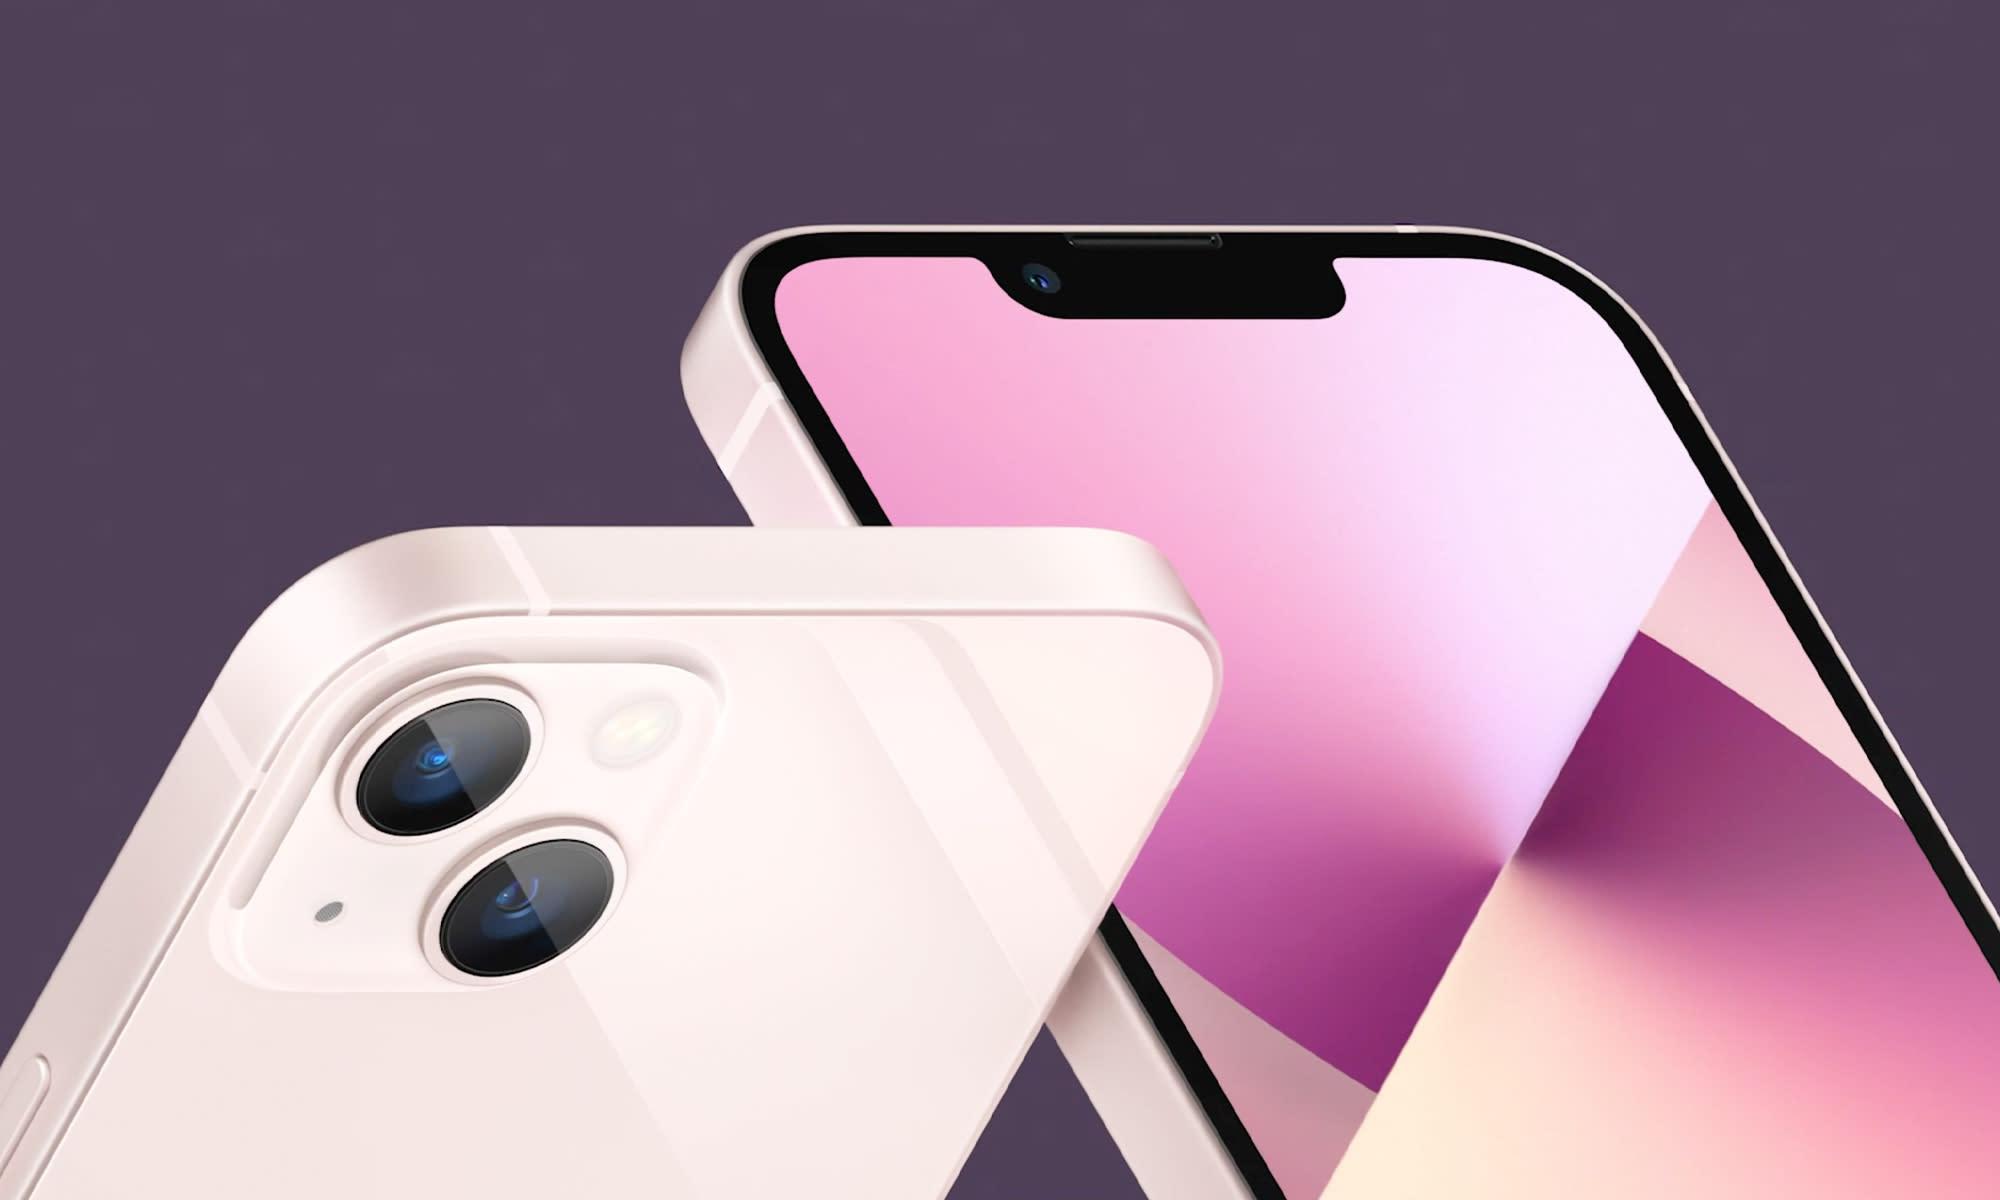 iPhone 13